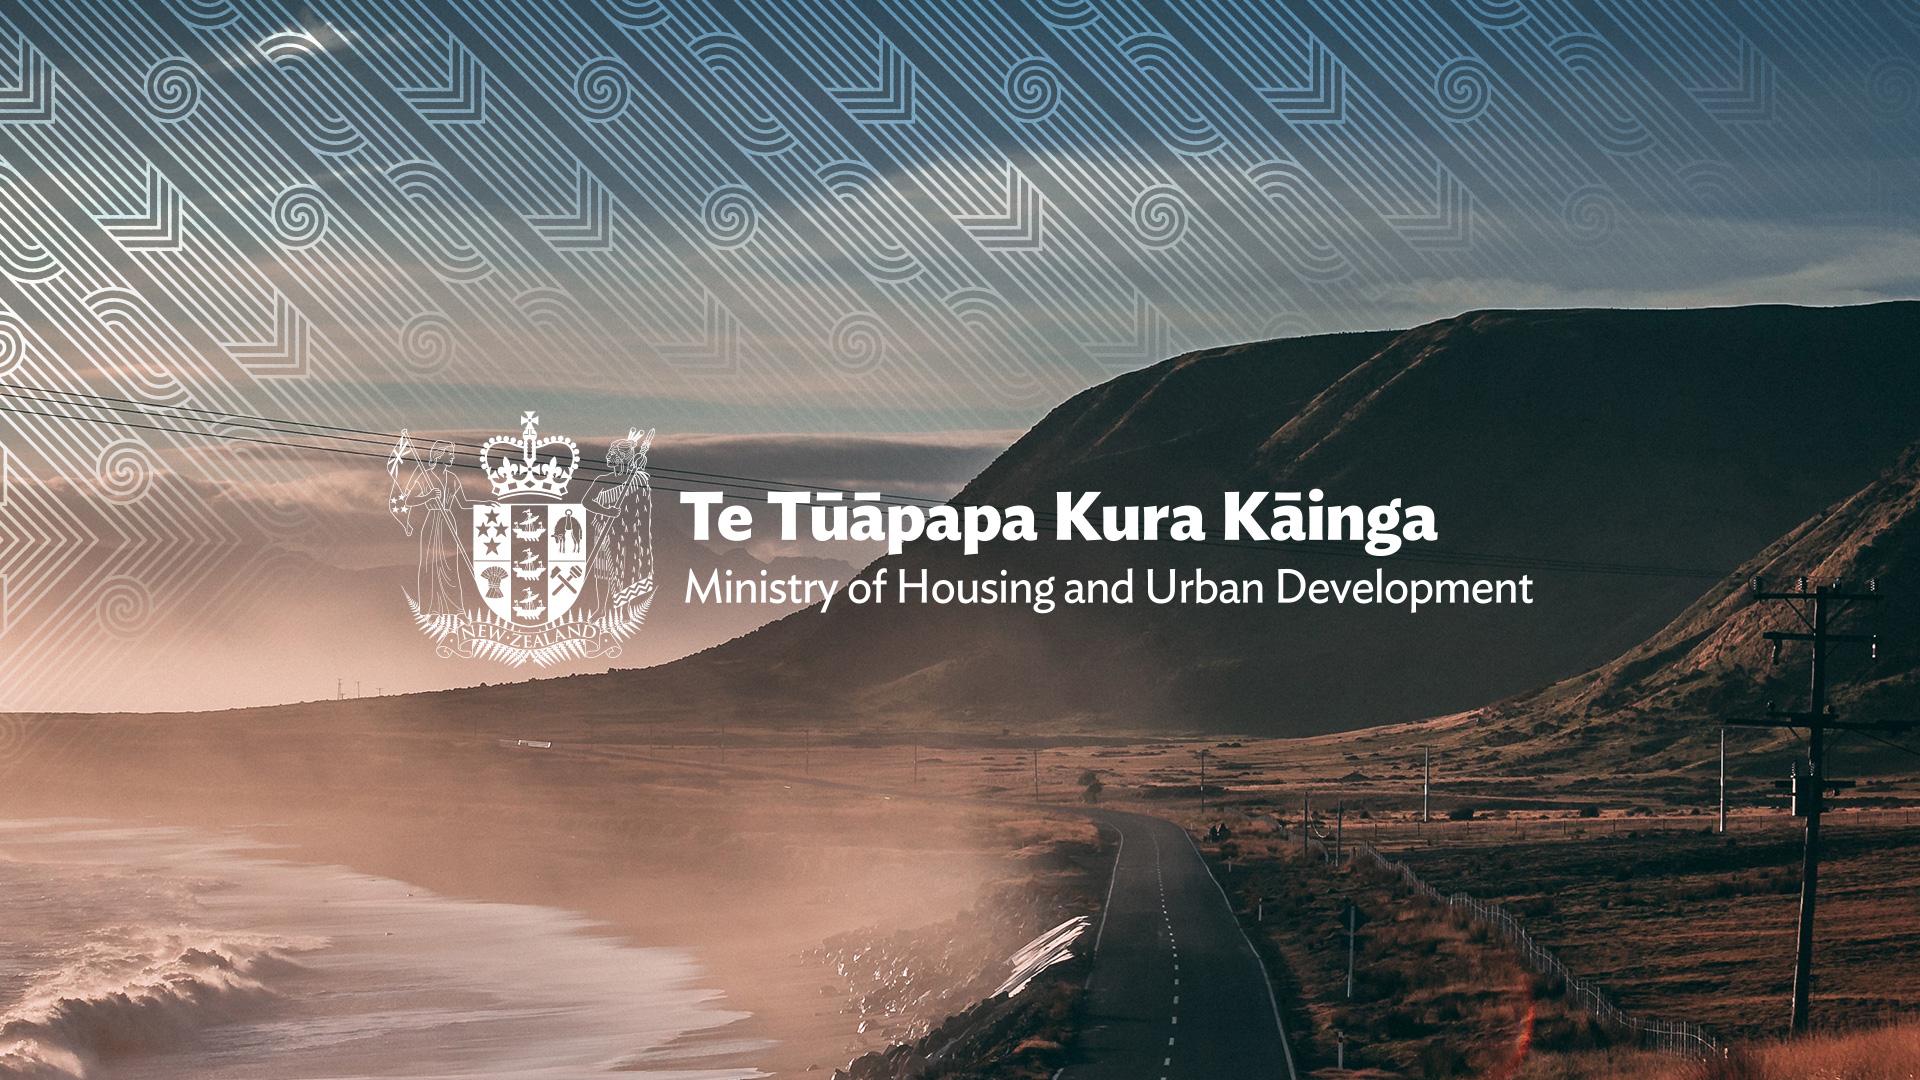 Te Tūāpapa Kura Kāinga